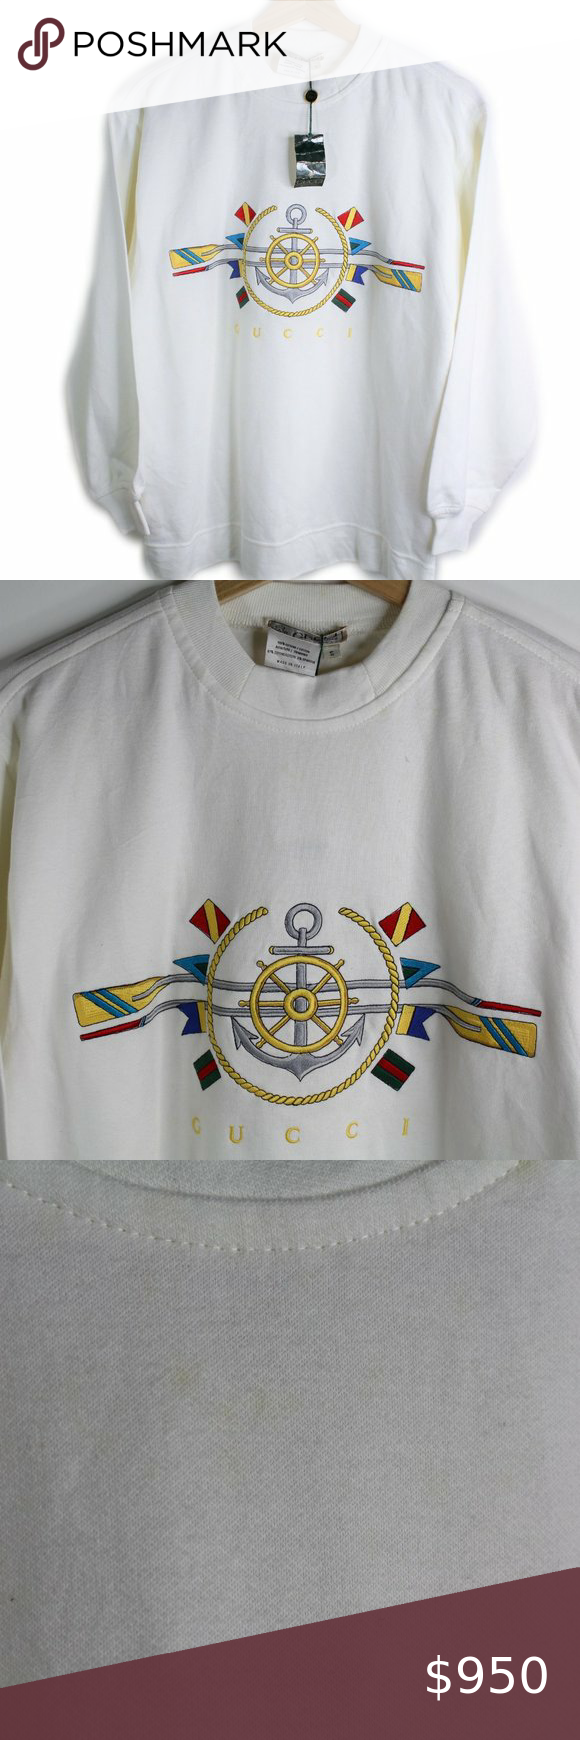 Vintage Gucci Nautical Crewneck Sweatshirt New Nwt Vintage Gucci Crew Neck Sweatshirt Sweatshirts [ 1740 x 580 Pixel ]